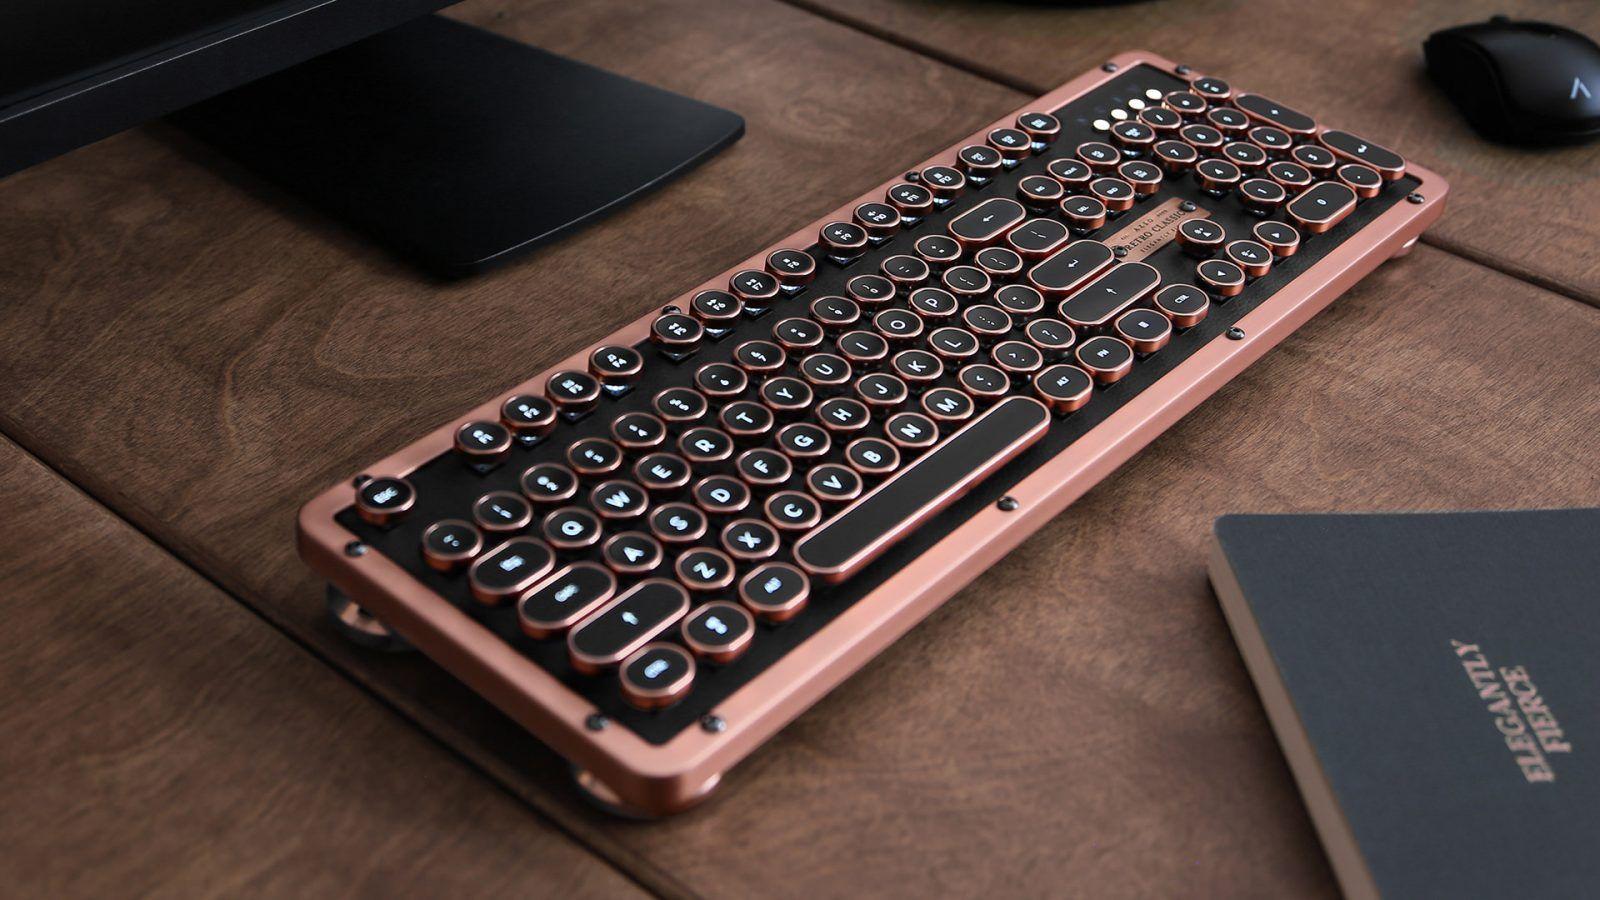 Azio Retro Classic The Traditional Mechanical Computer Keyboard In 2020 Keyboard Computer Computer Keyboard